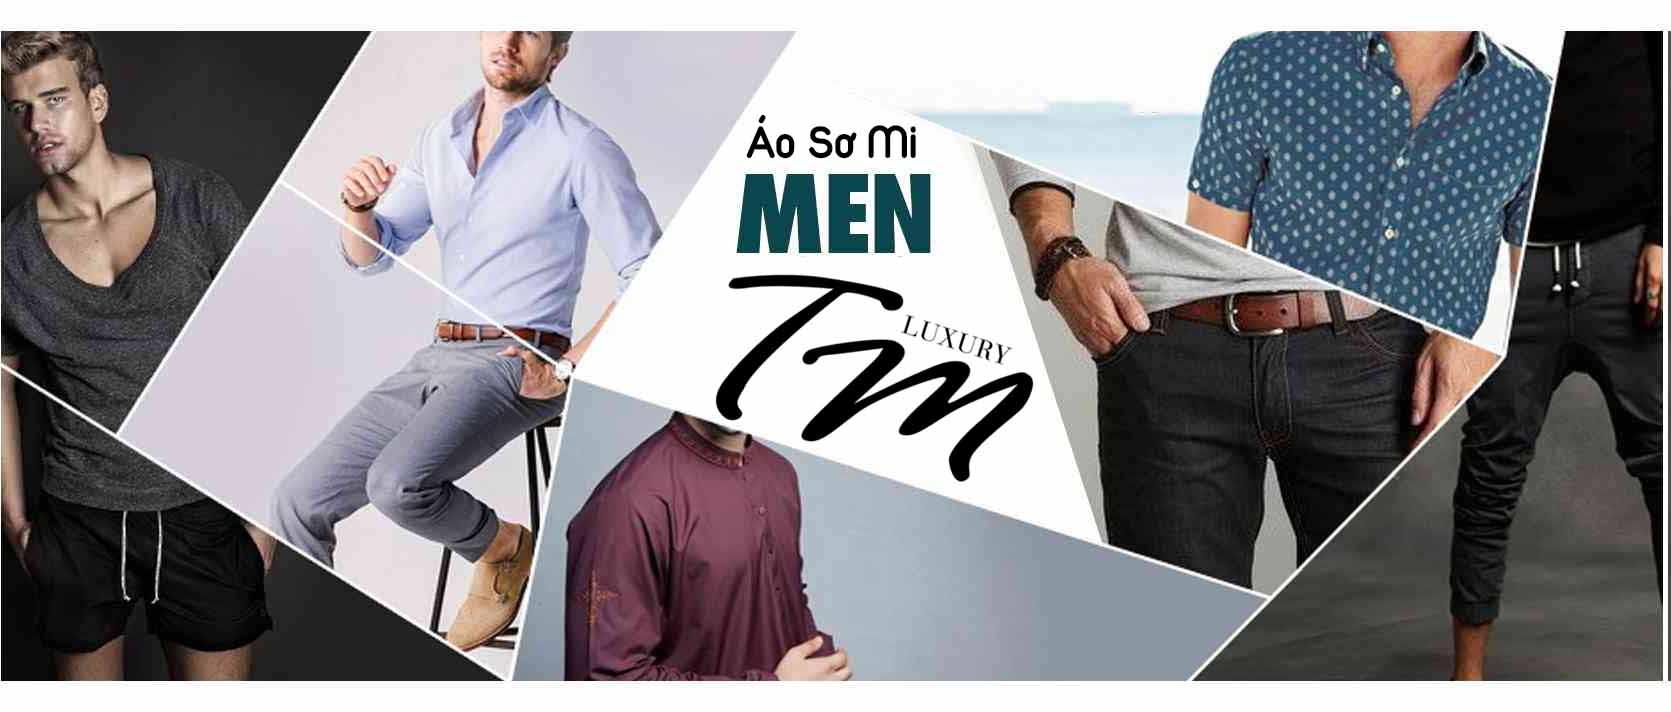 Áo sơ mi nam【TM Luxury Shop】✦ Mới Nhất 2019